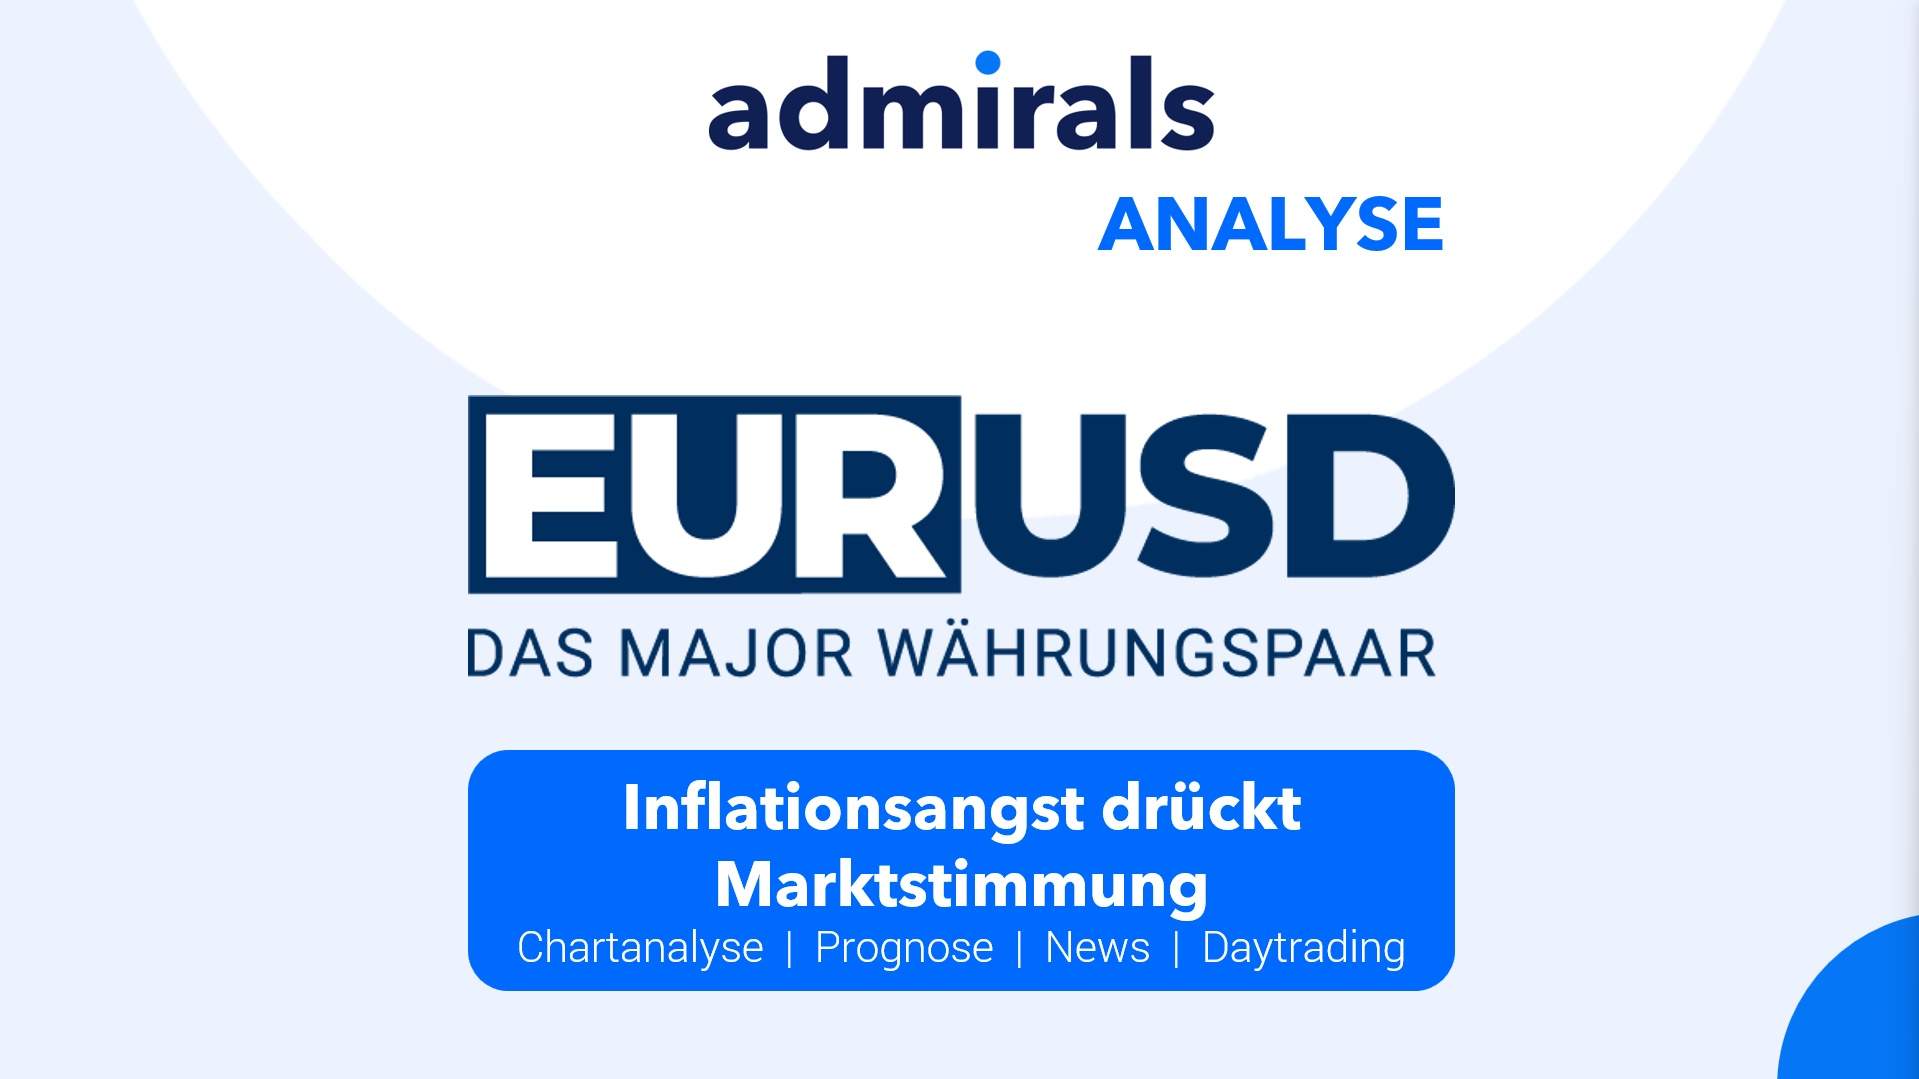 EURUSD-Analyse-Erneute-Inflationsangst-drückt-Marktstimmung-Kommentar-Admirals-GodmodeTrader.de-1